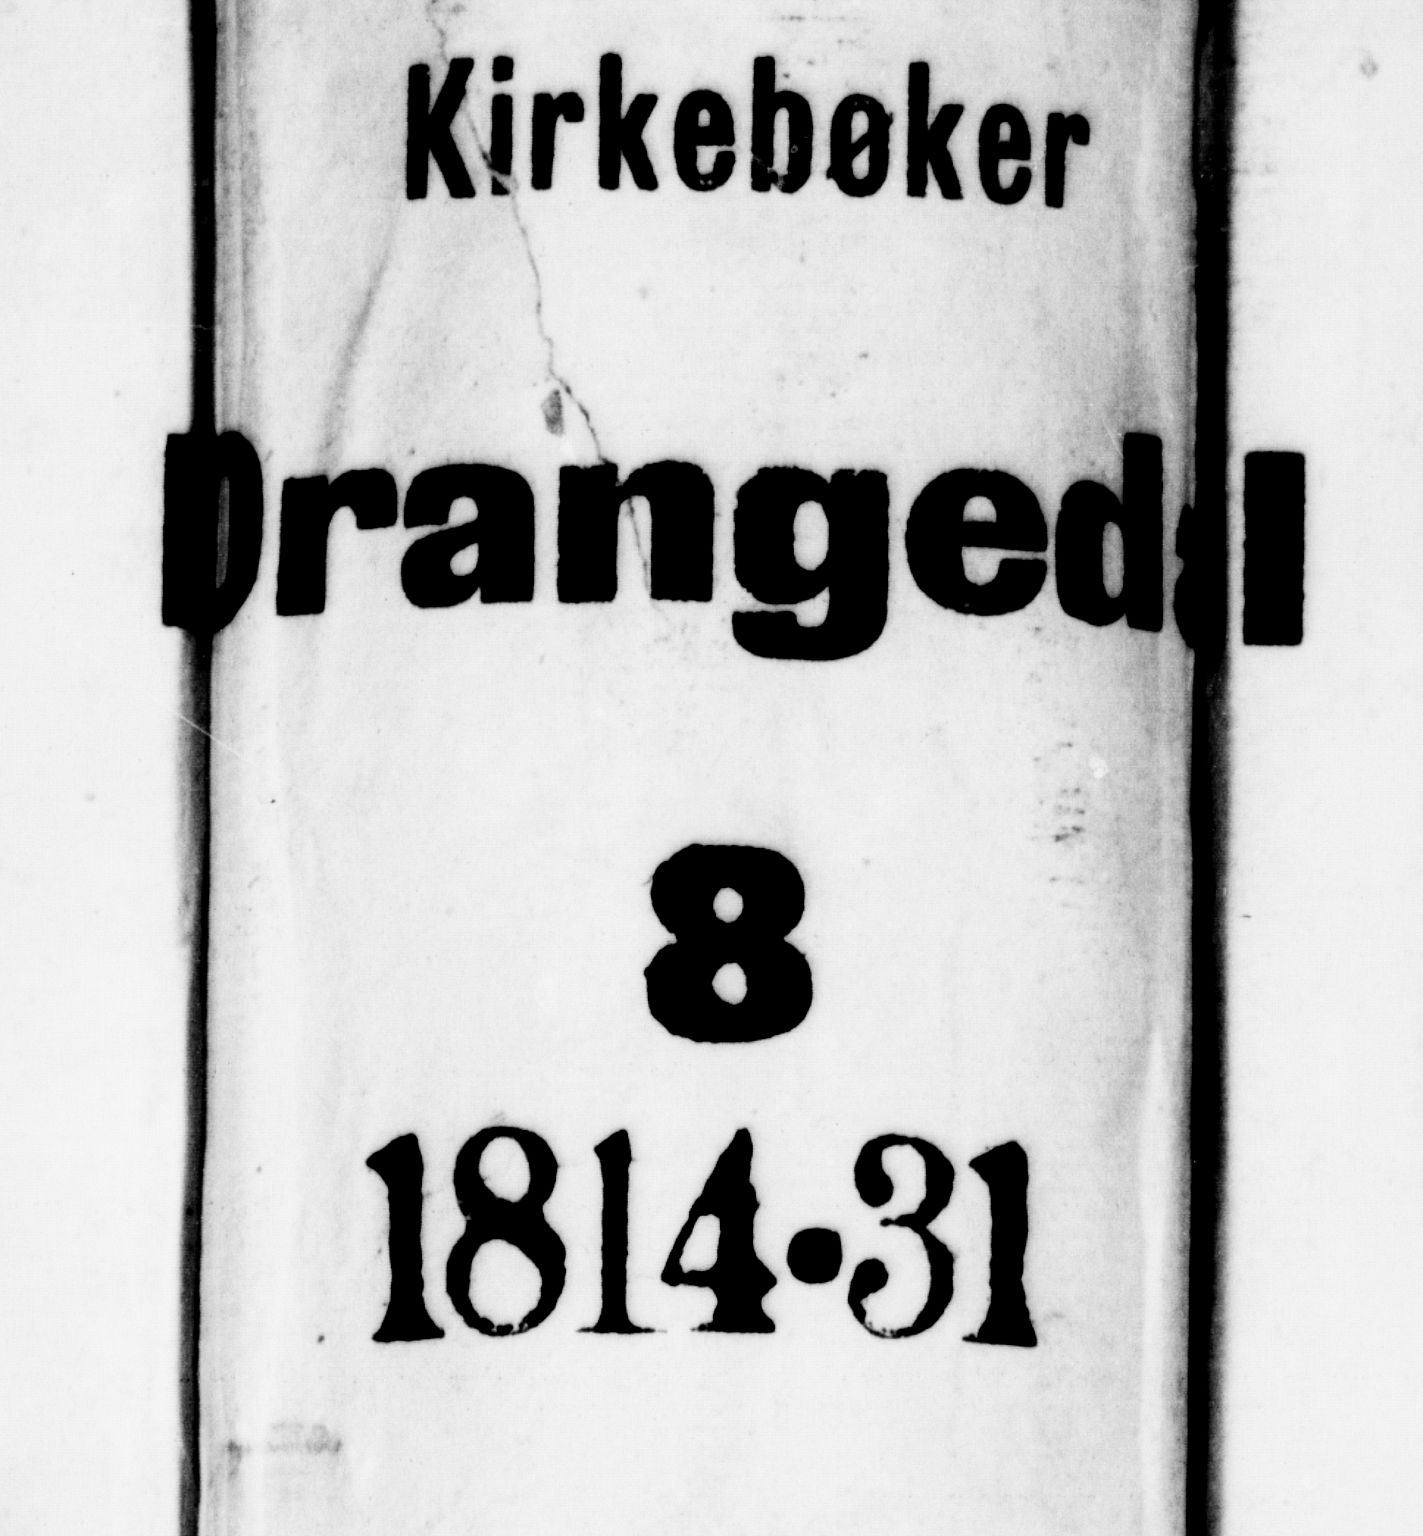 SAKO, Drangedal kirkebøker, F/Fa/L0005: Ministerialbok nr. 5 /1, 1814-1831